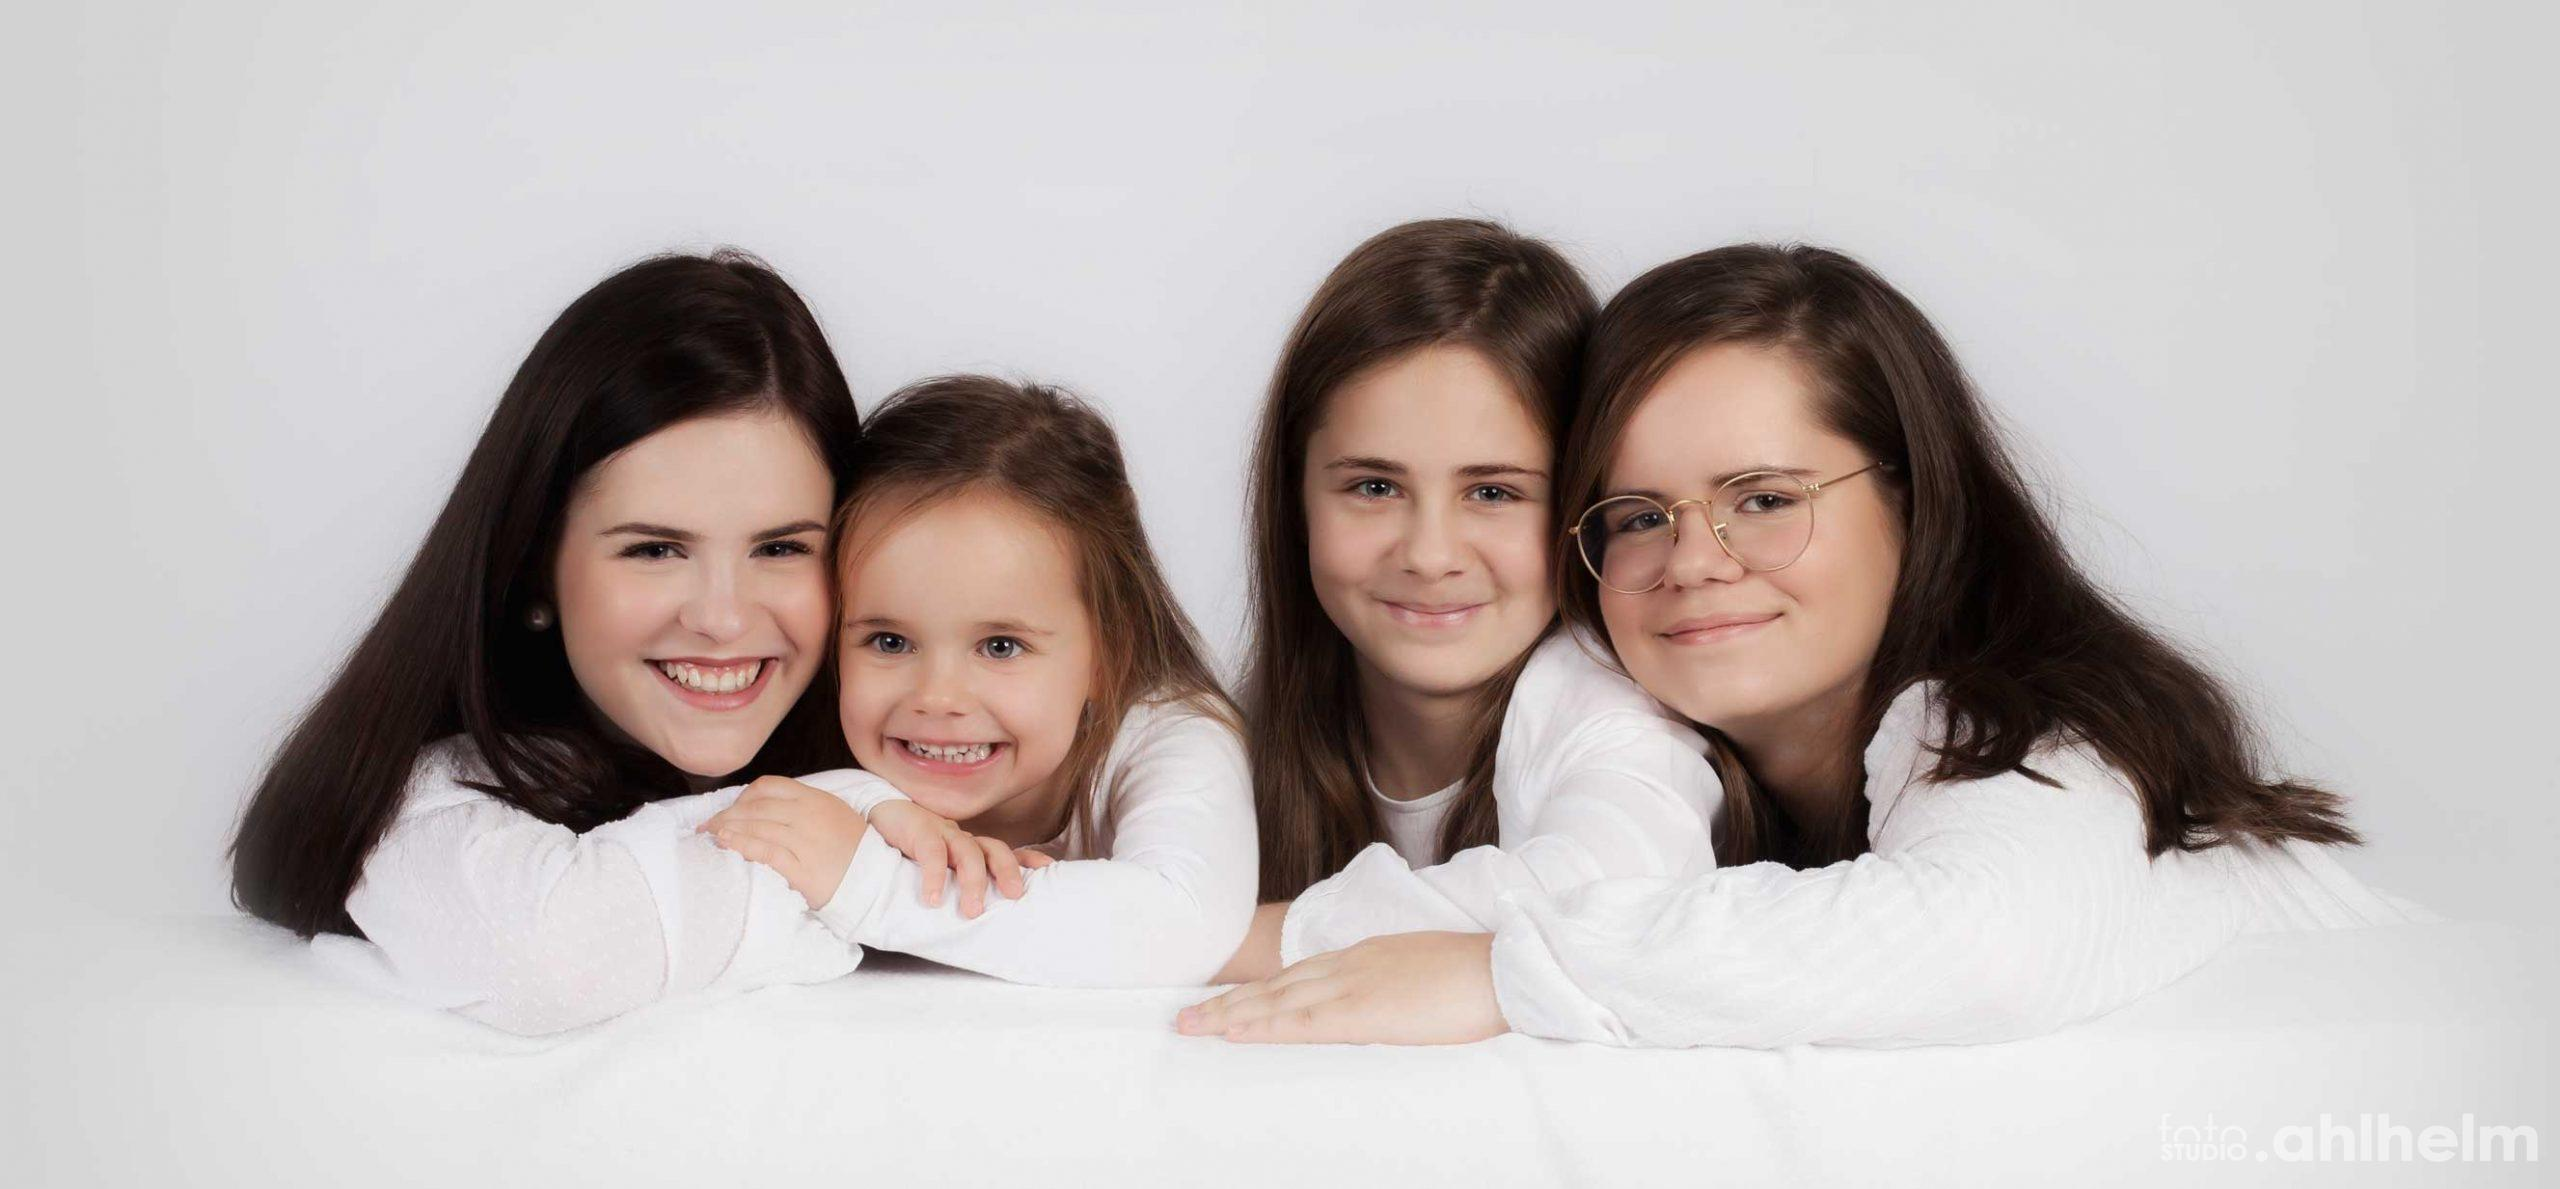 Fotostudio Ahlhelm Familie Geschwister